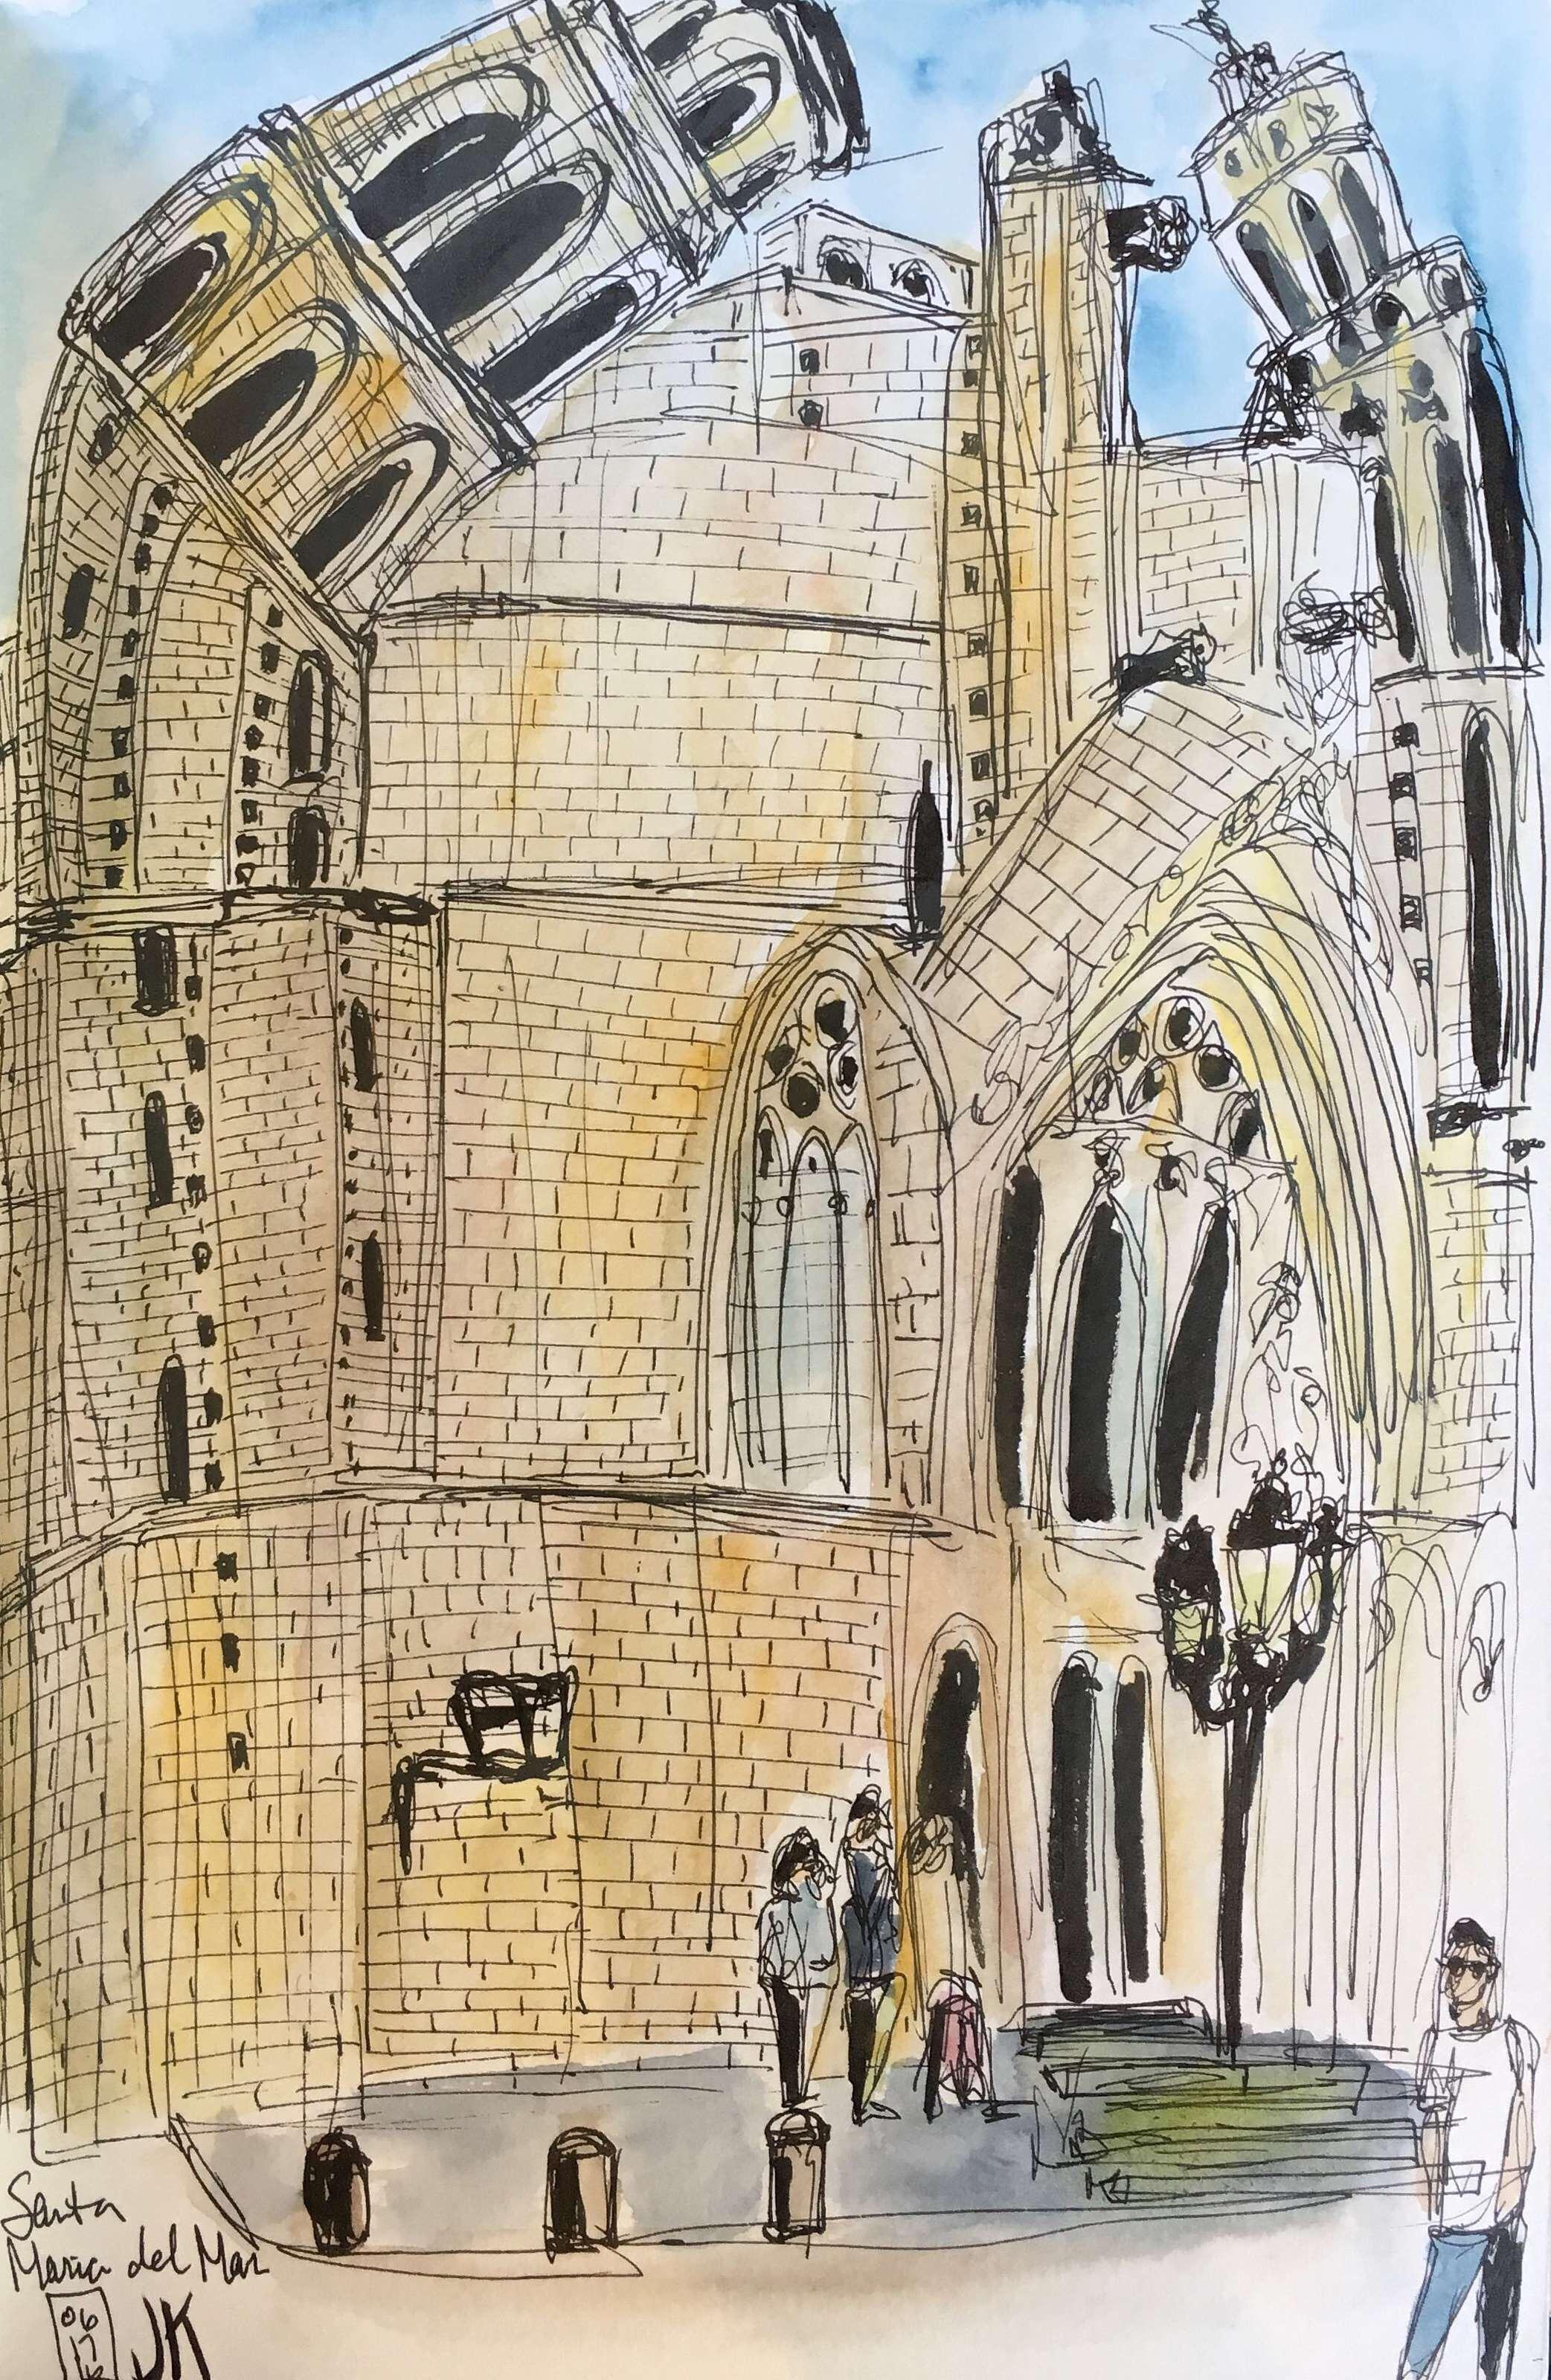 Church of Santa Maria del Mar in Born, Barcelona